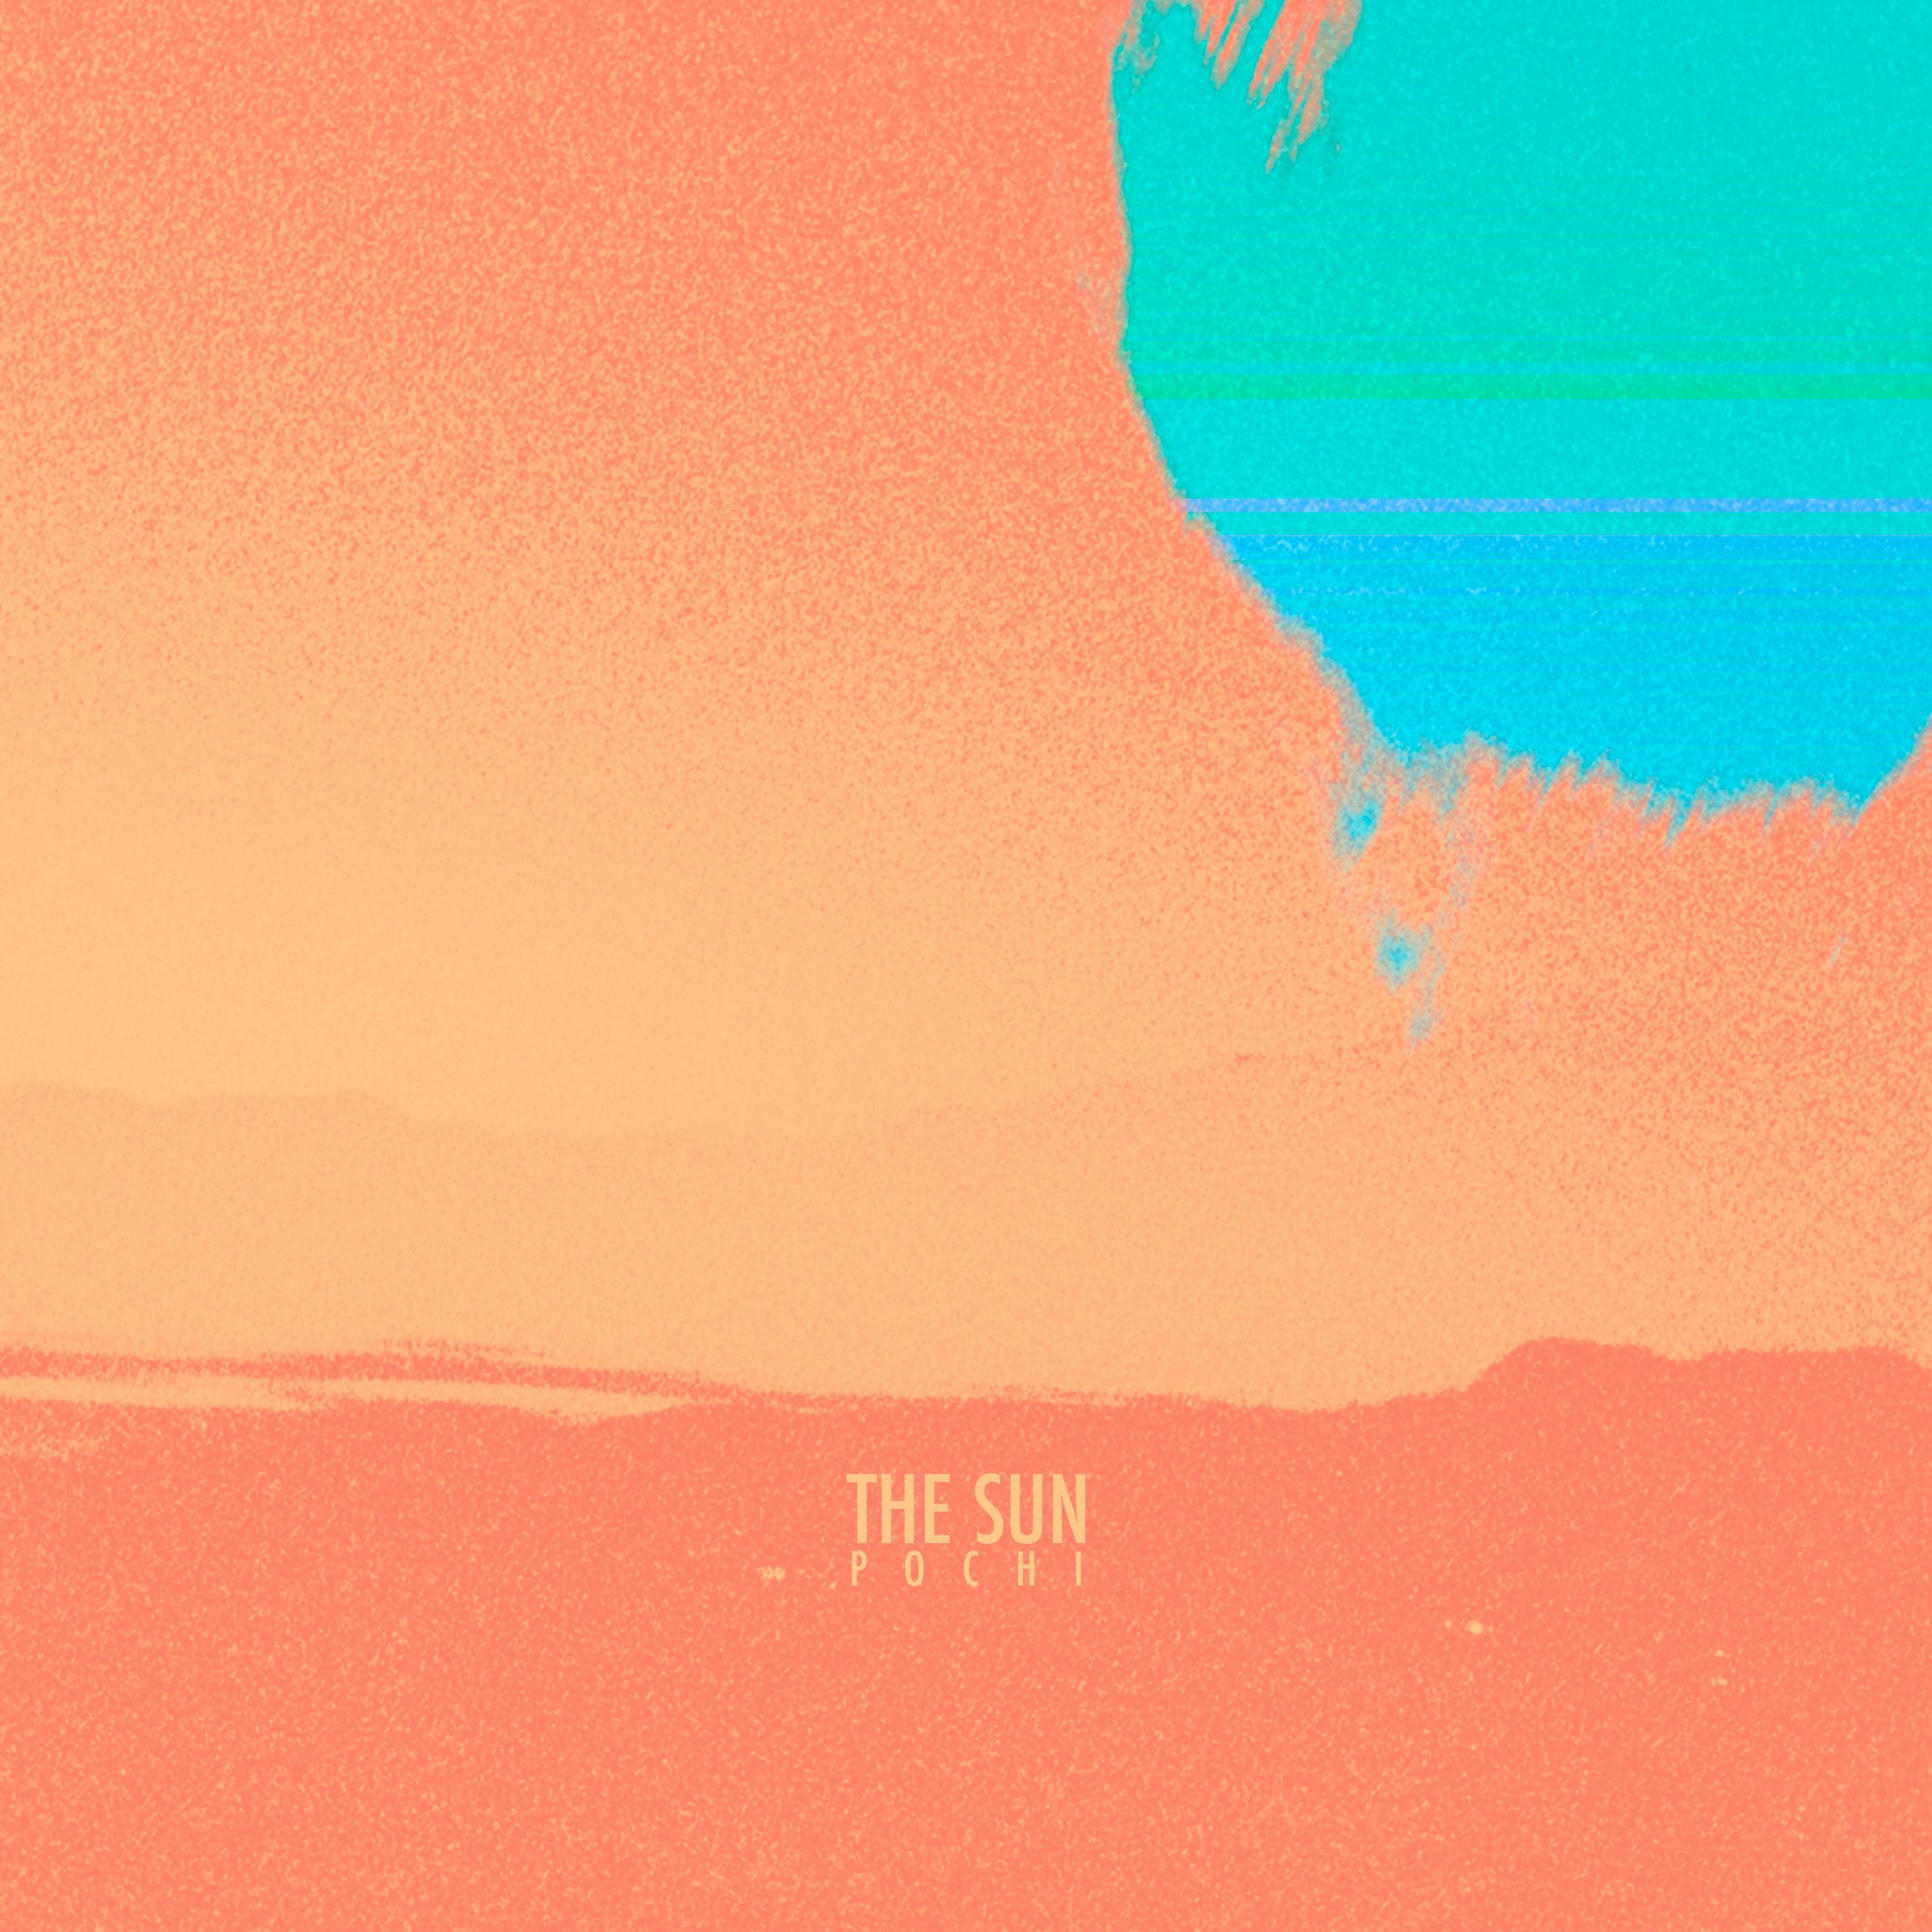 THESUN005.jpg